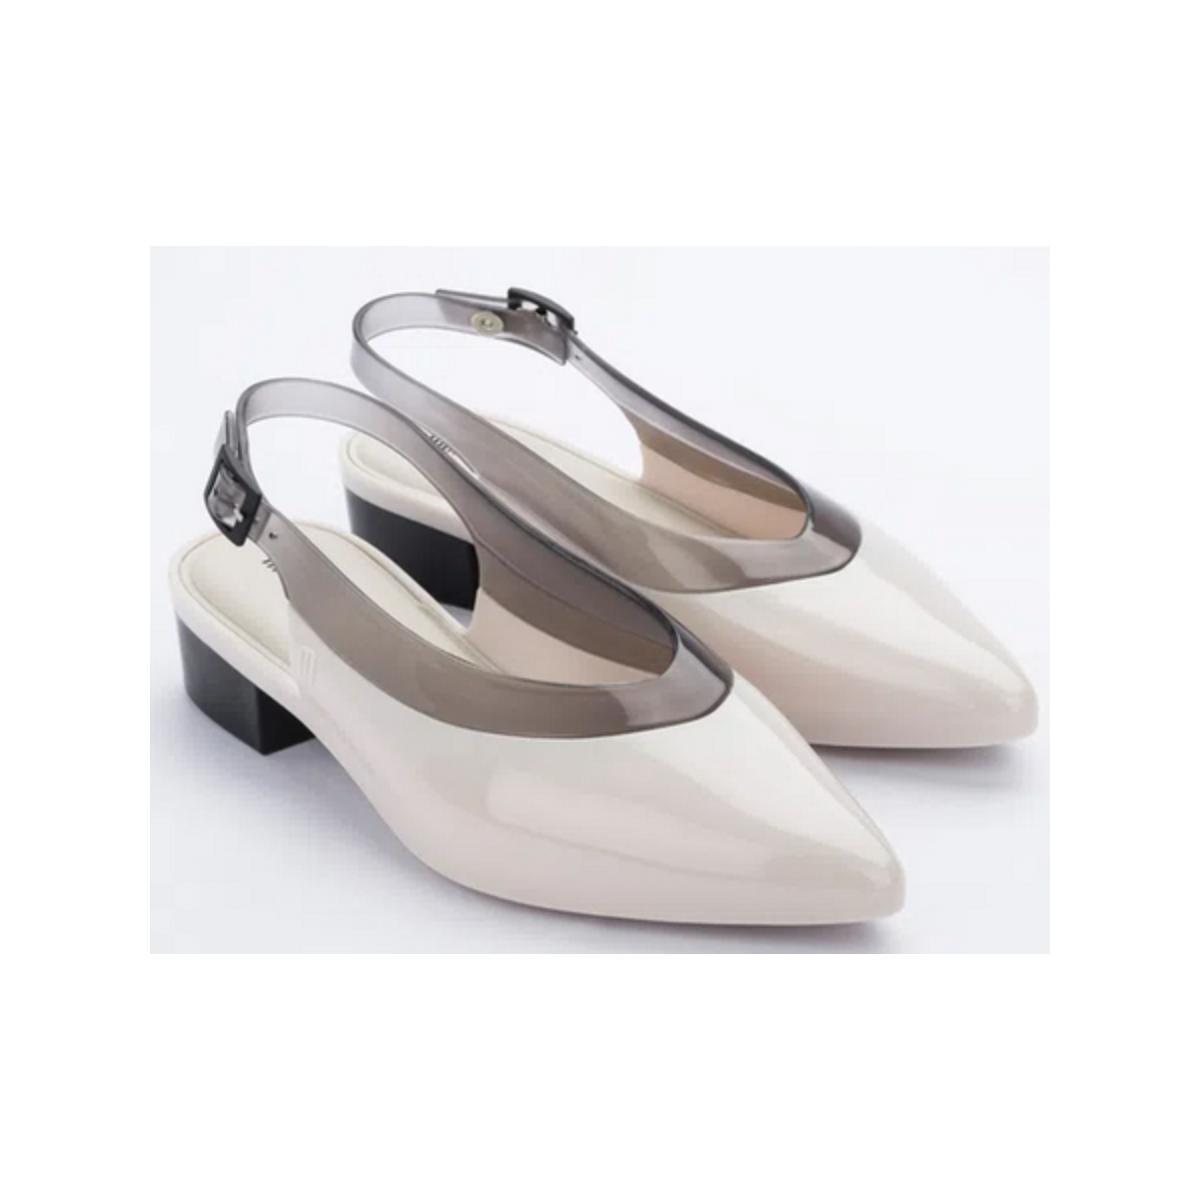 Sapato Feminino Melissa 32906 53408  Cleo Heel ad Bege/fume